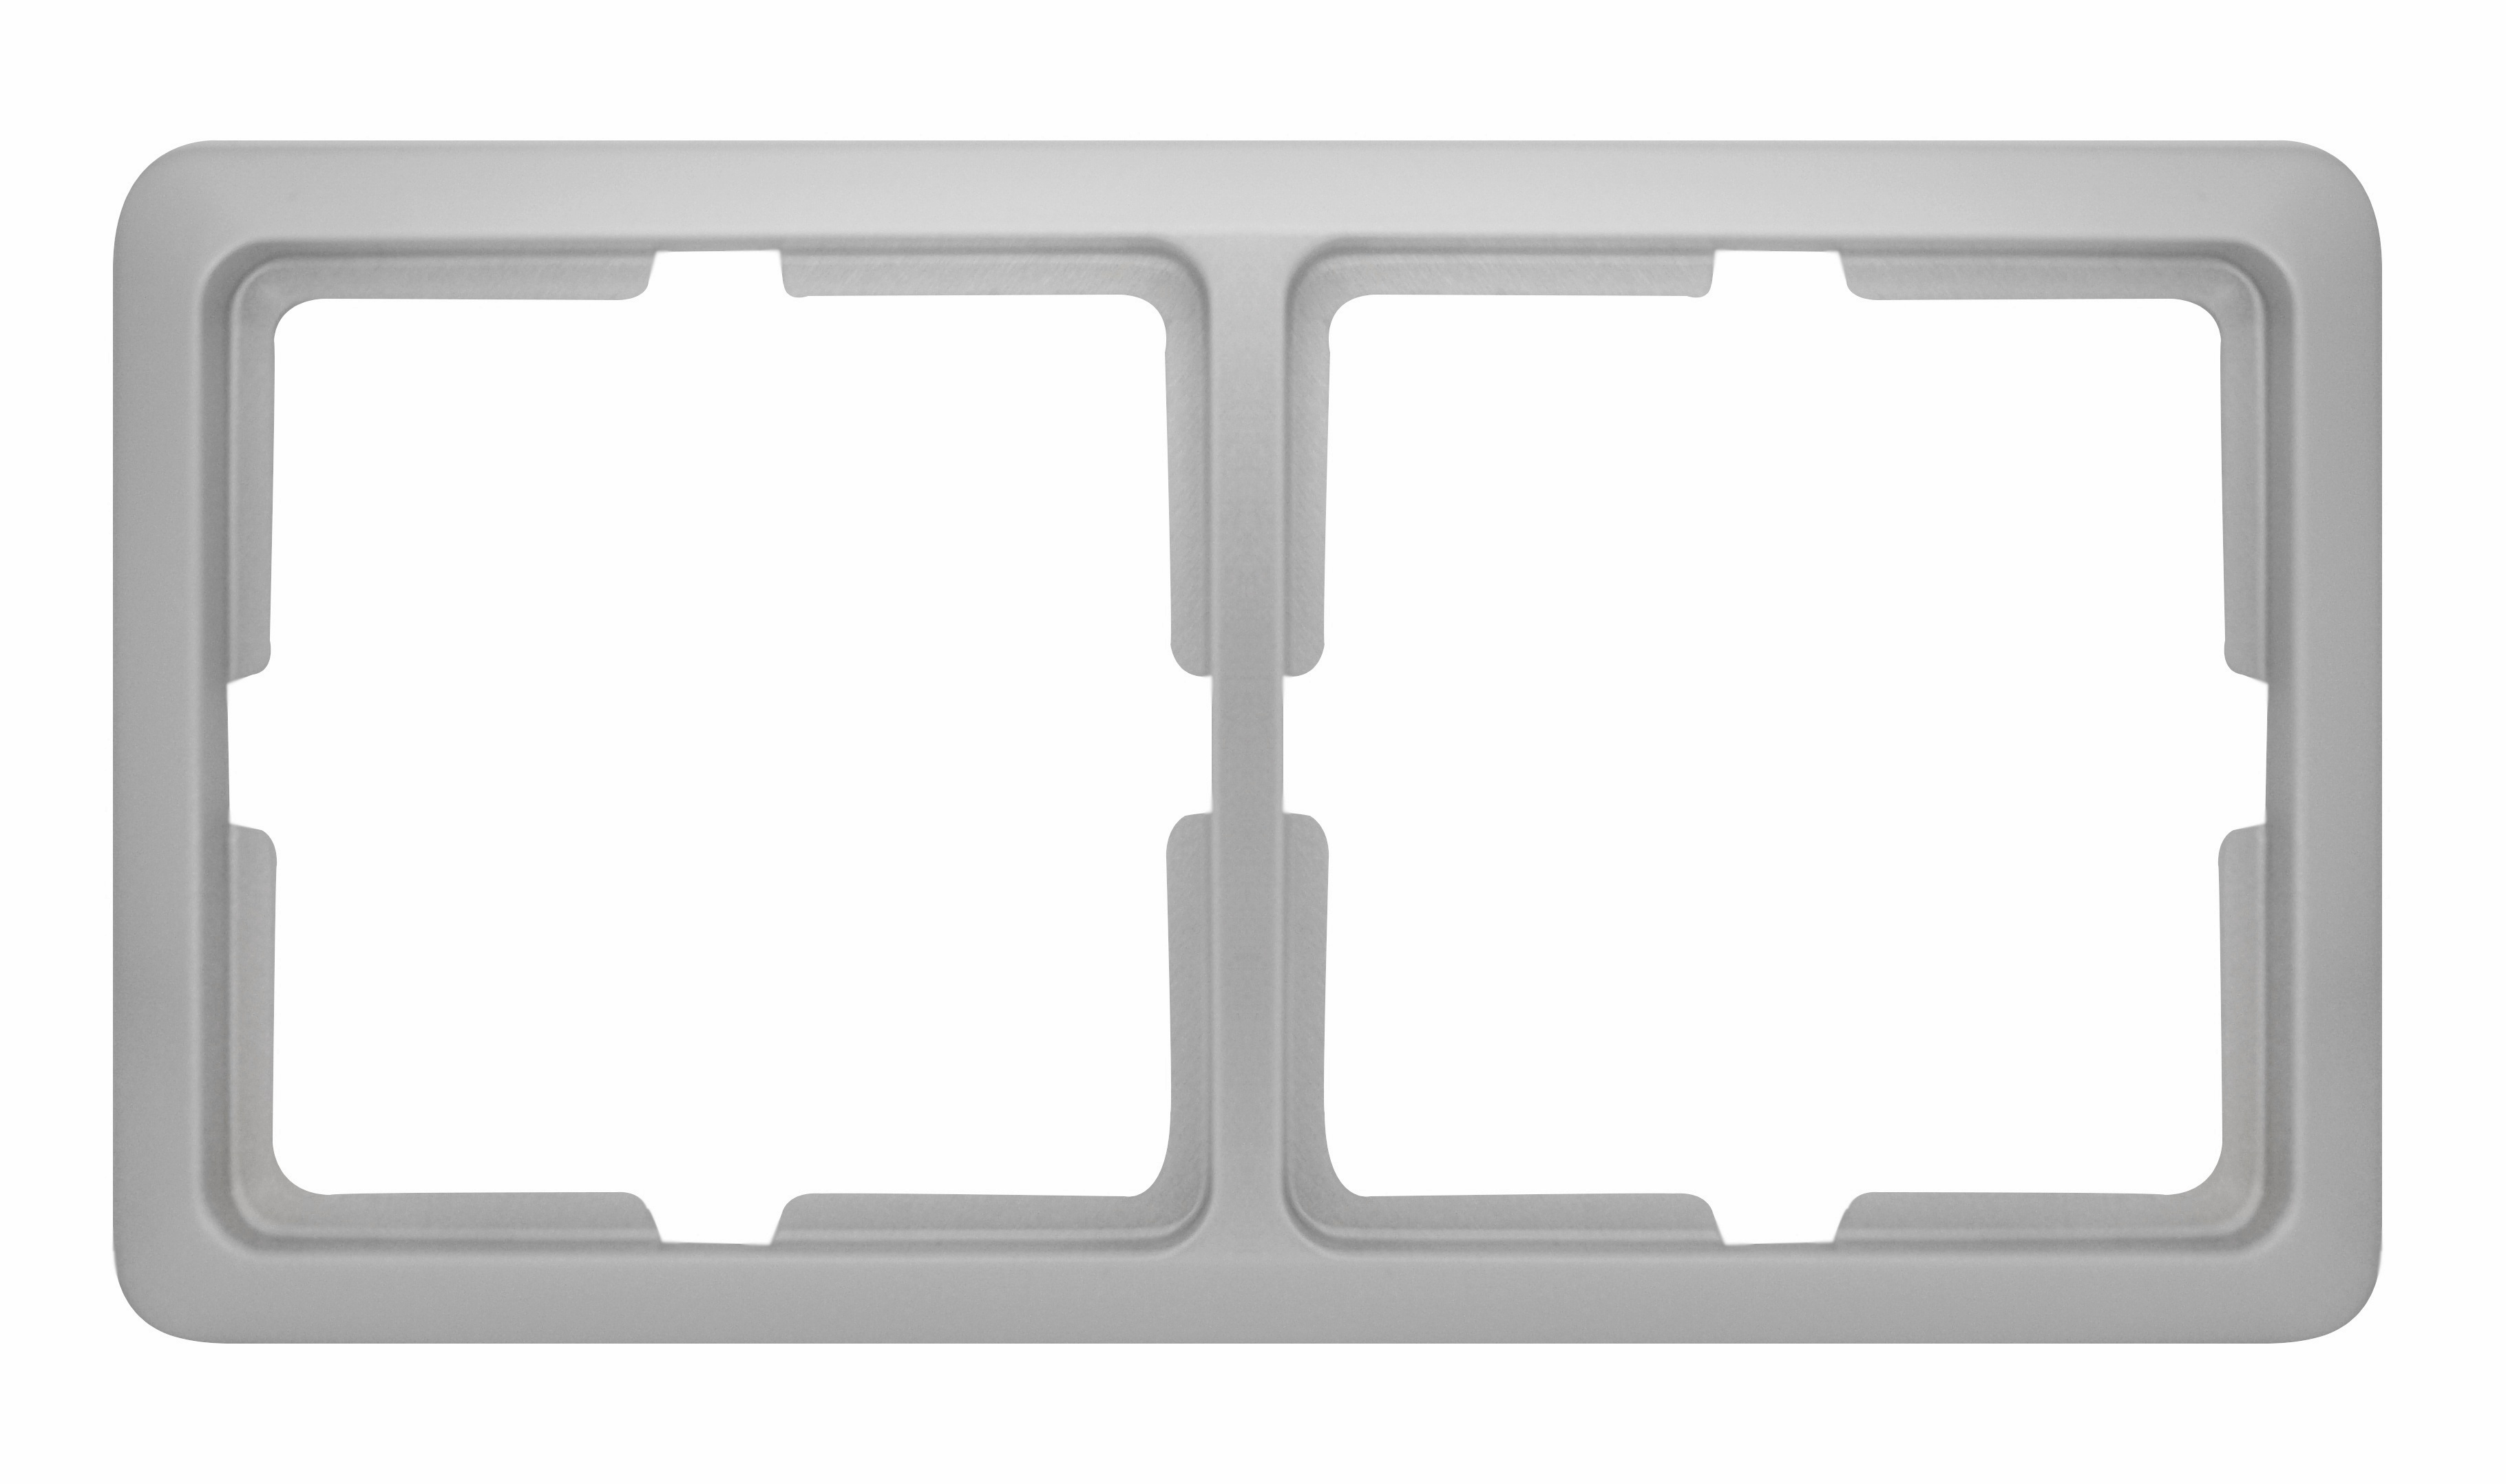 1 Stk Rahmen 2-fach, Edelstahleffekt Scala EL2042111-